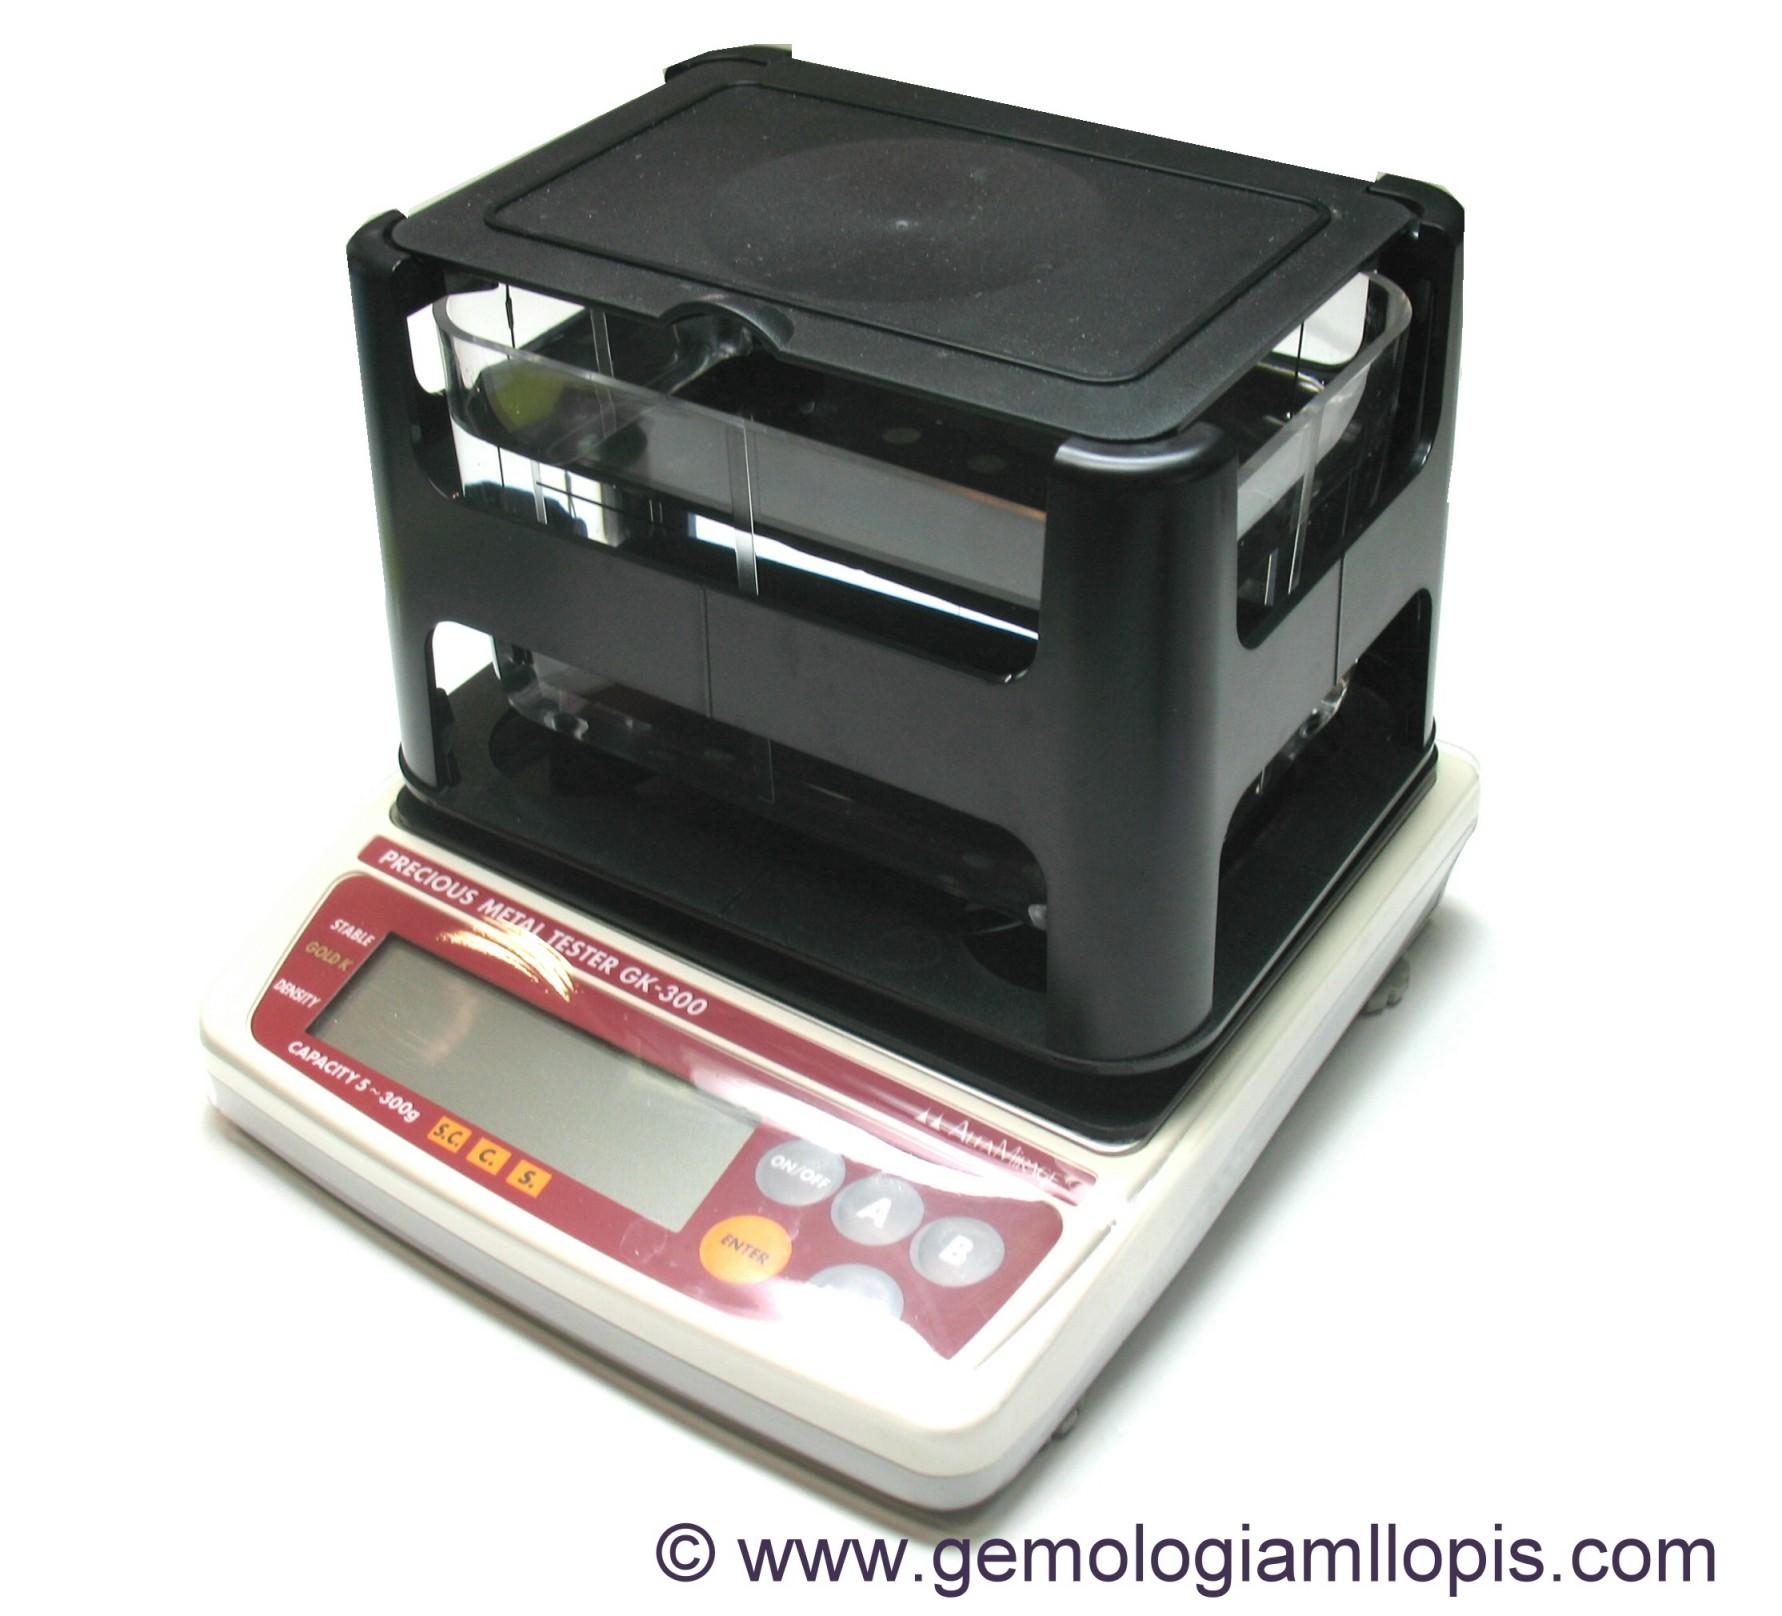 Balanza densimetro GK-300, calcula por densidad la ley del oro plata o platino.